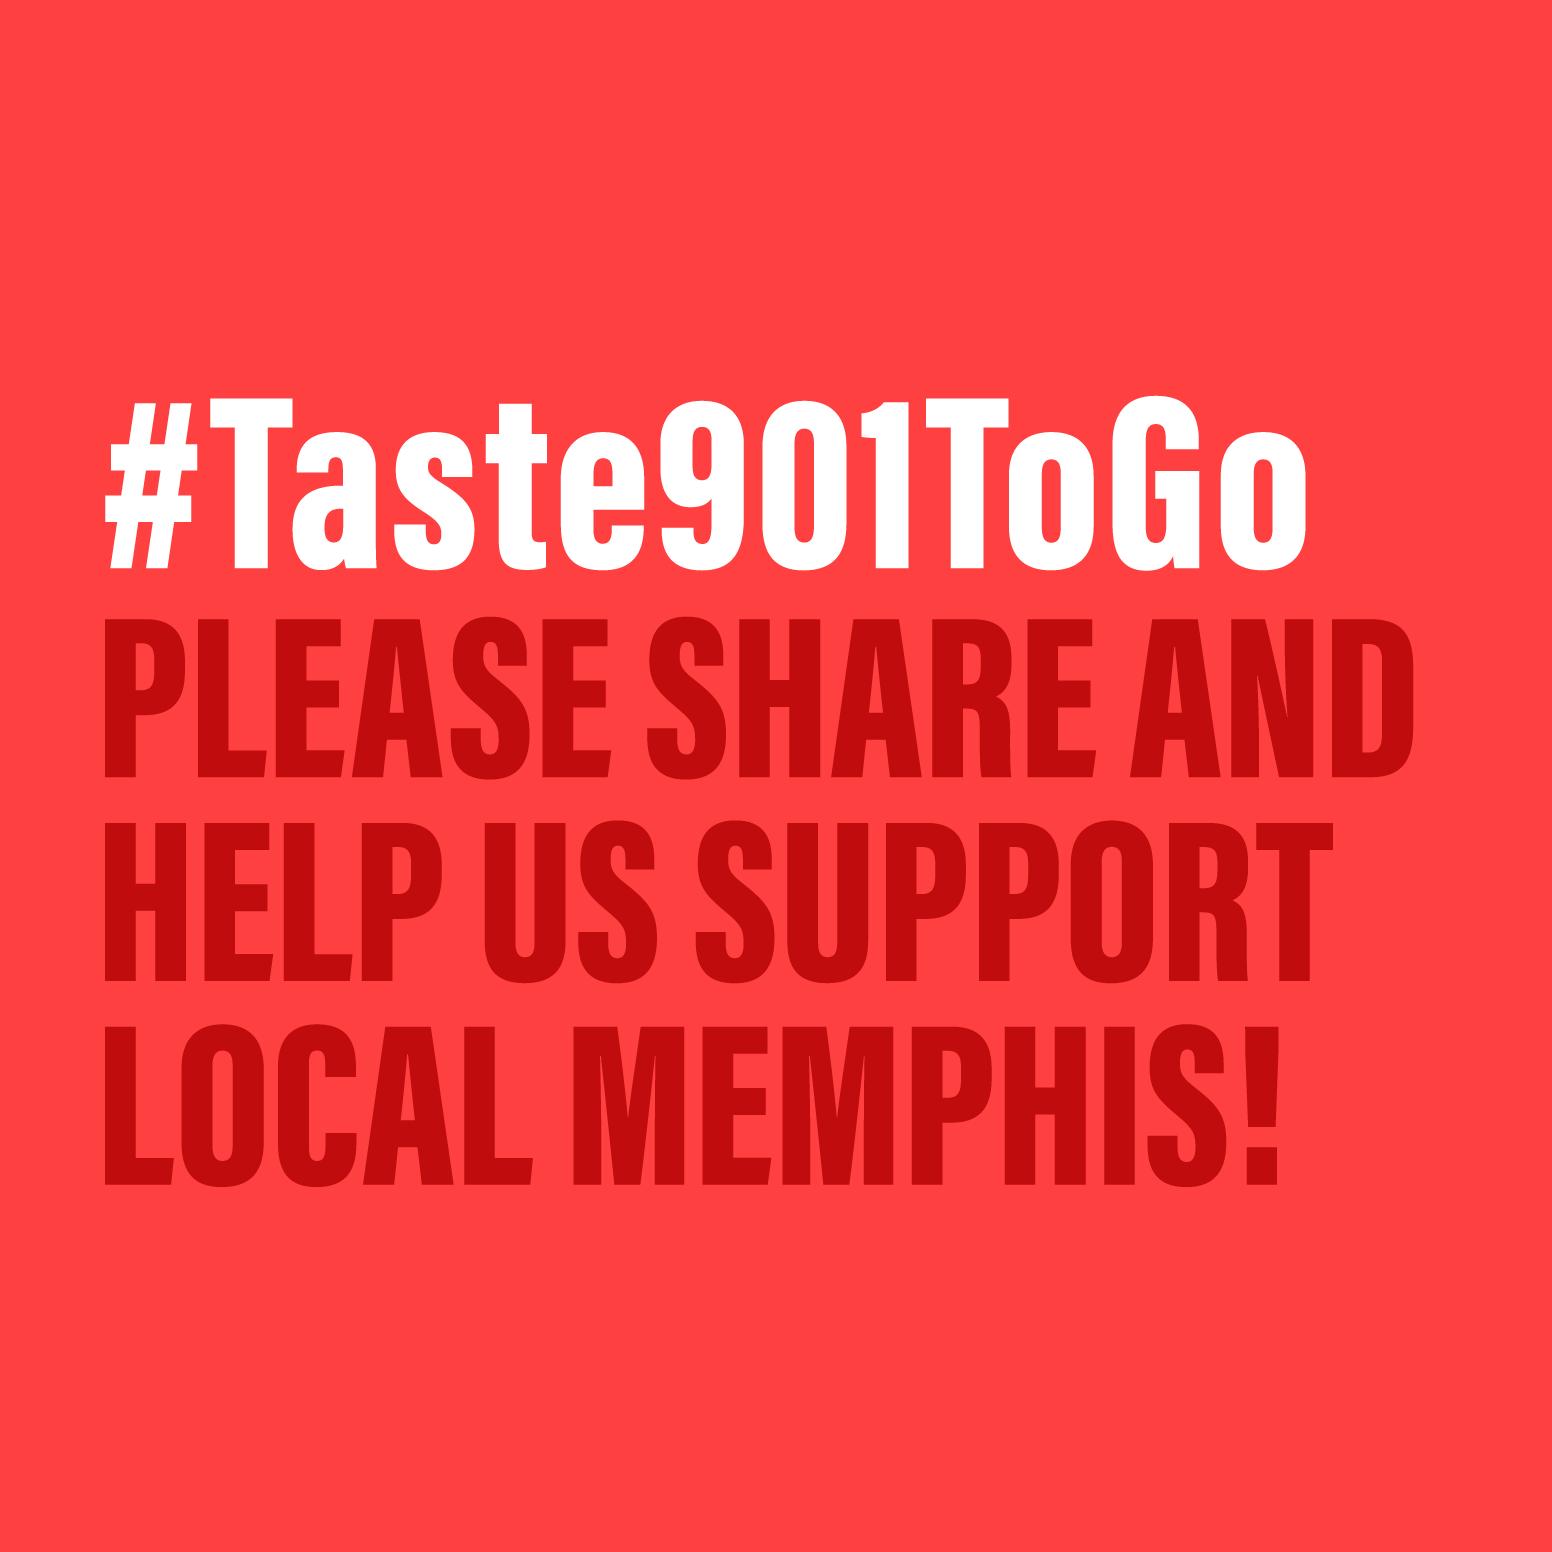 Taste901ToGo